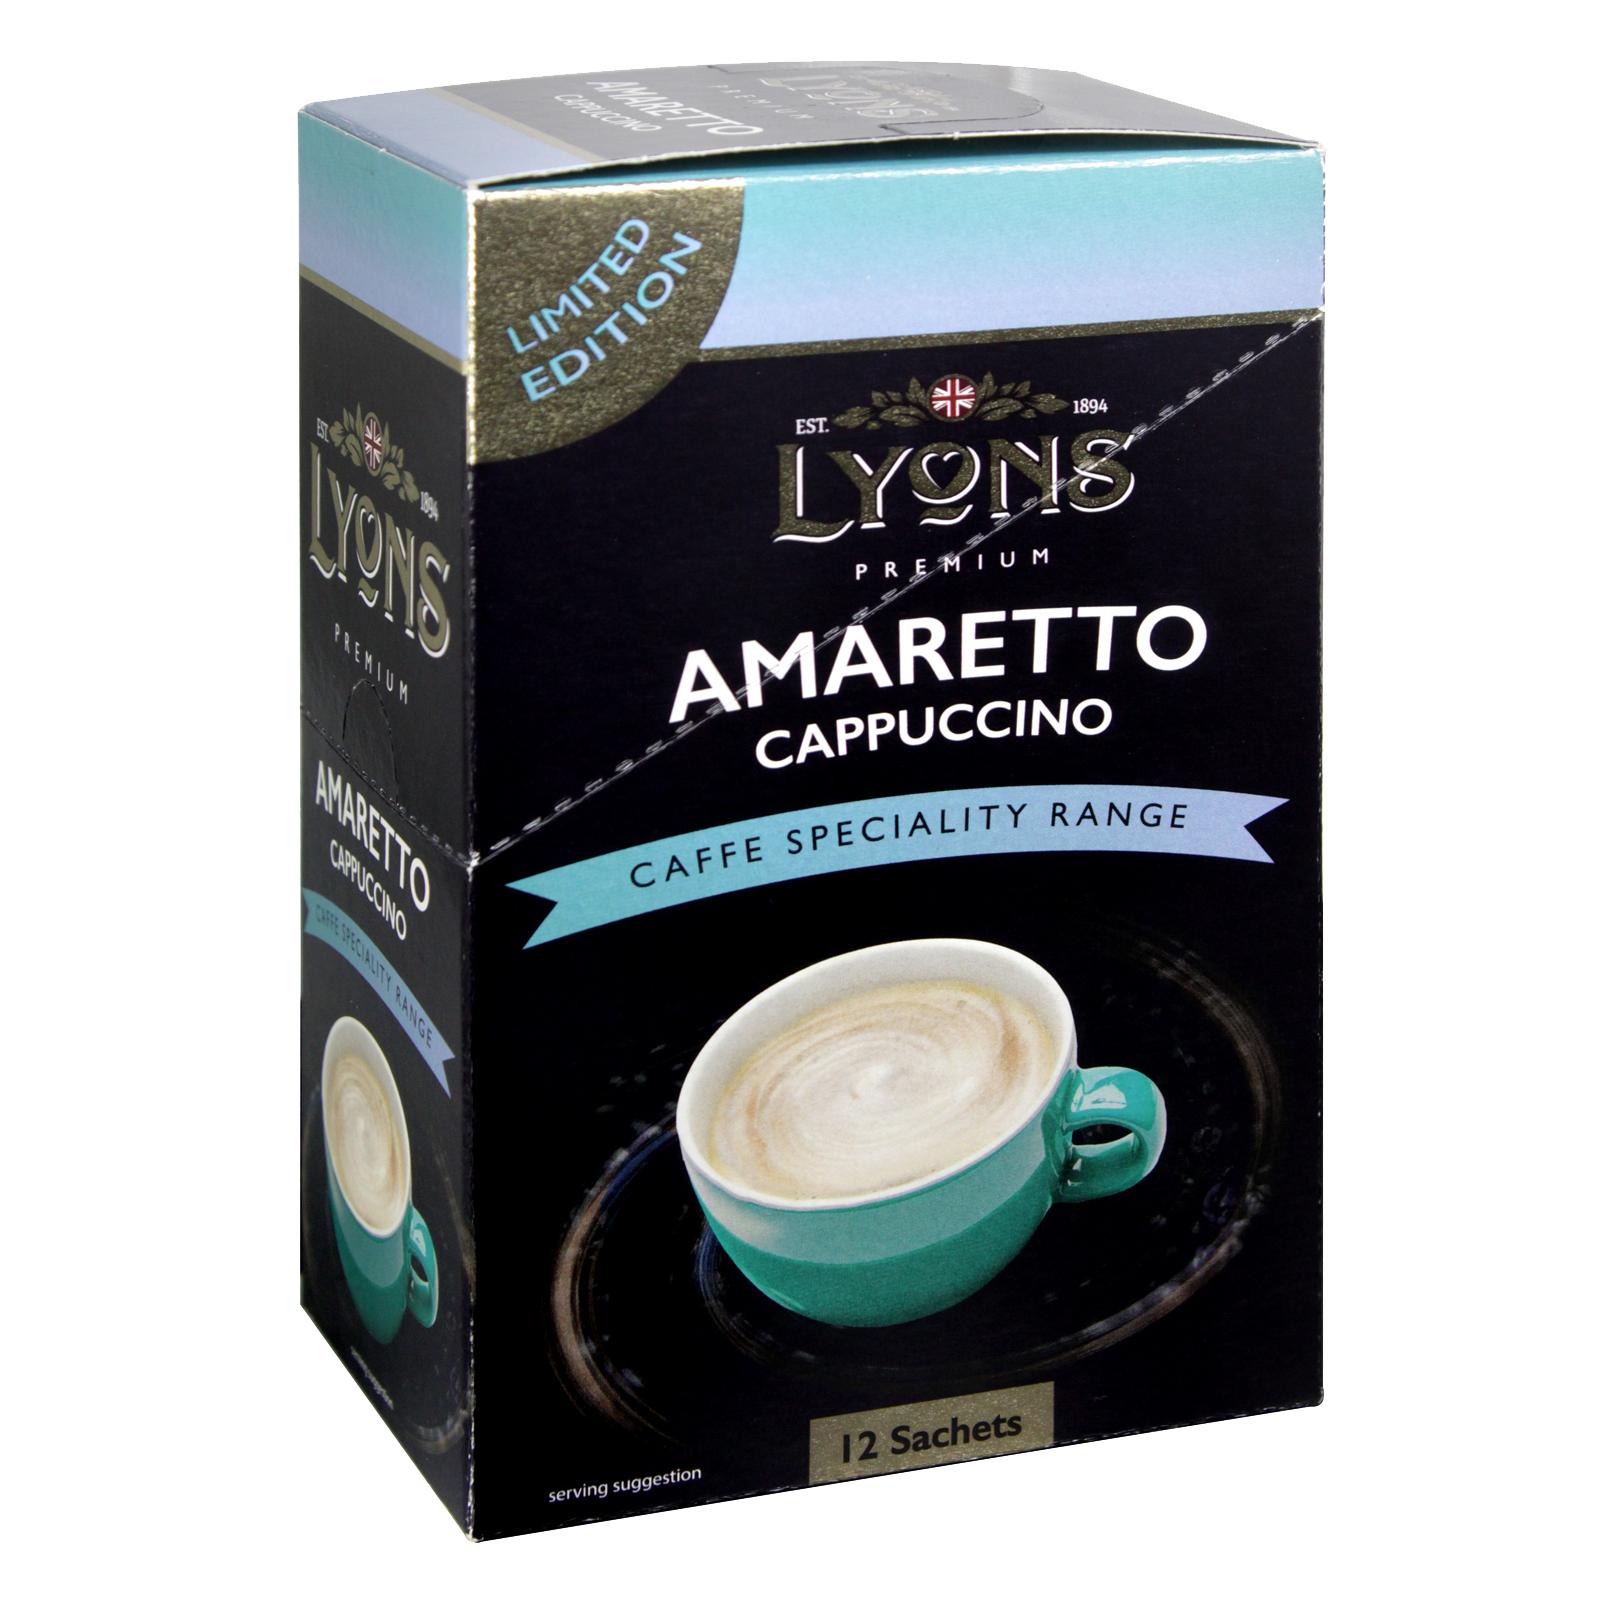 LYONS CAFFE SPECIALITY AMARETTO CAPPUCCINO 12 SACHETS X20